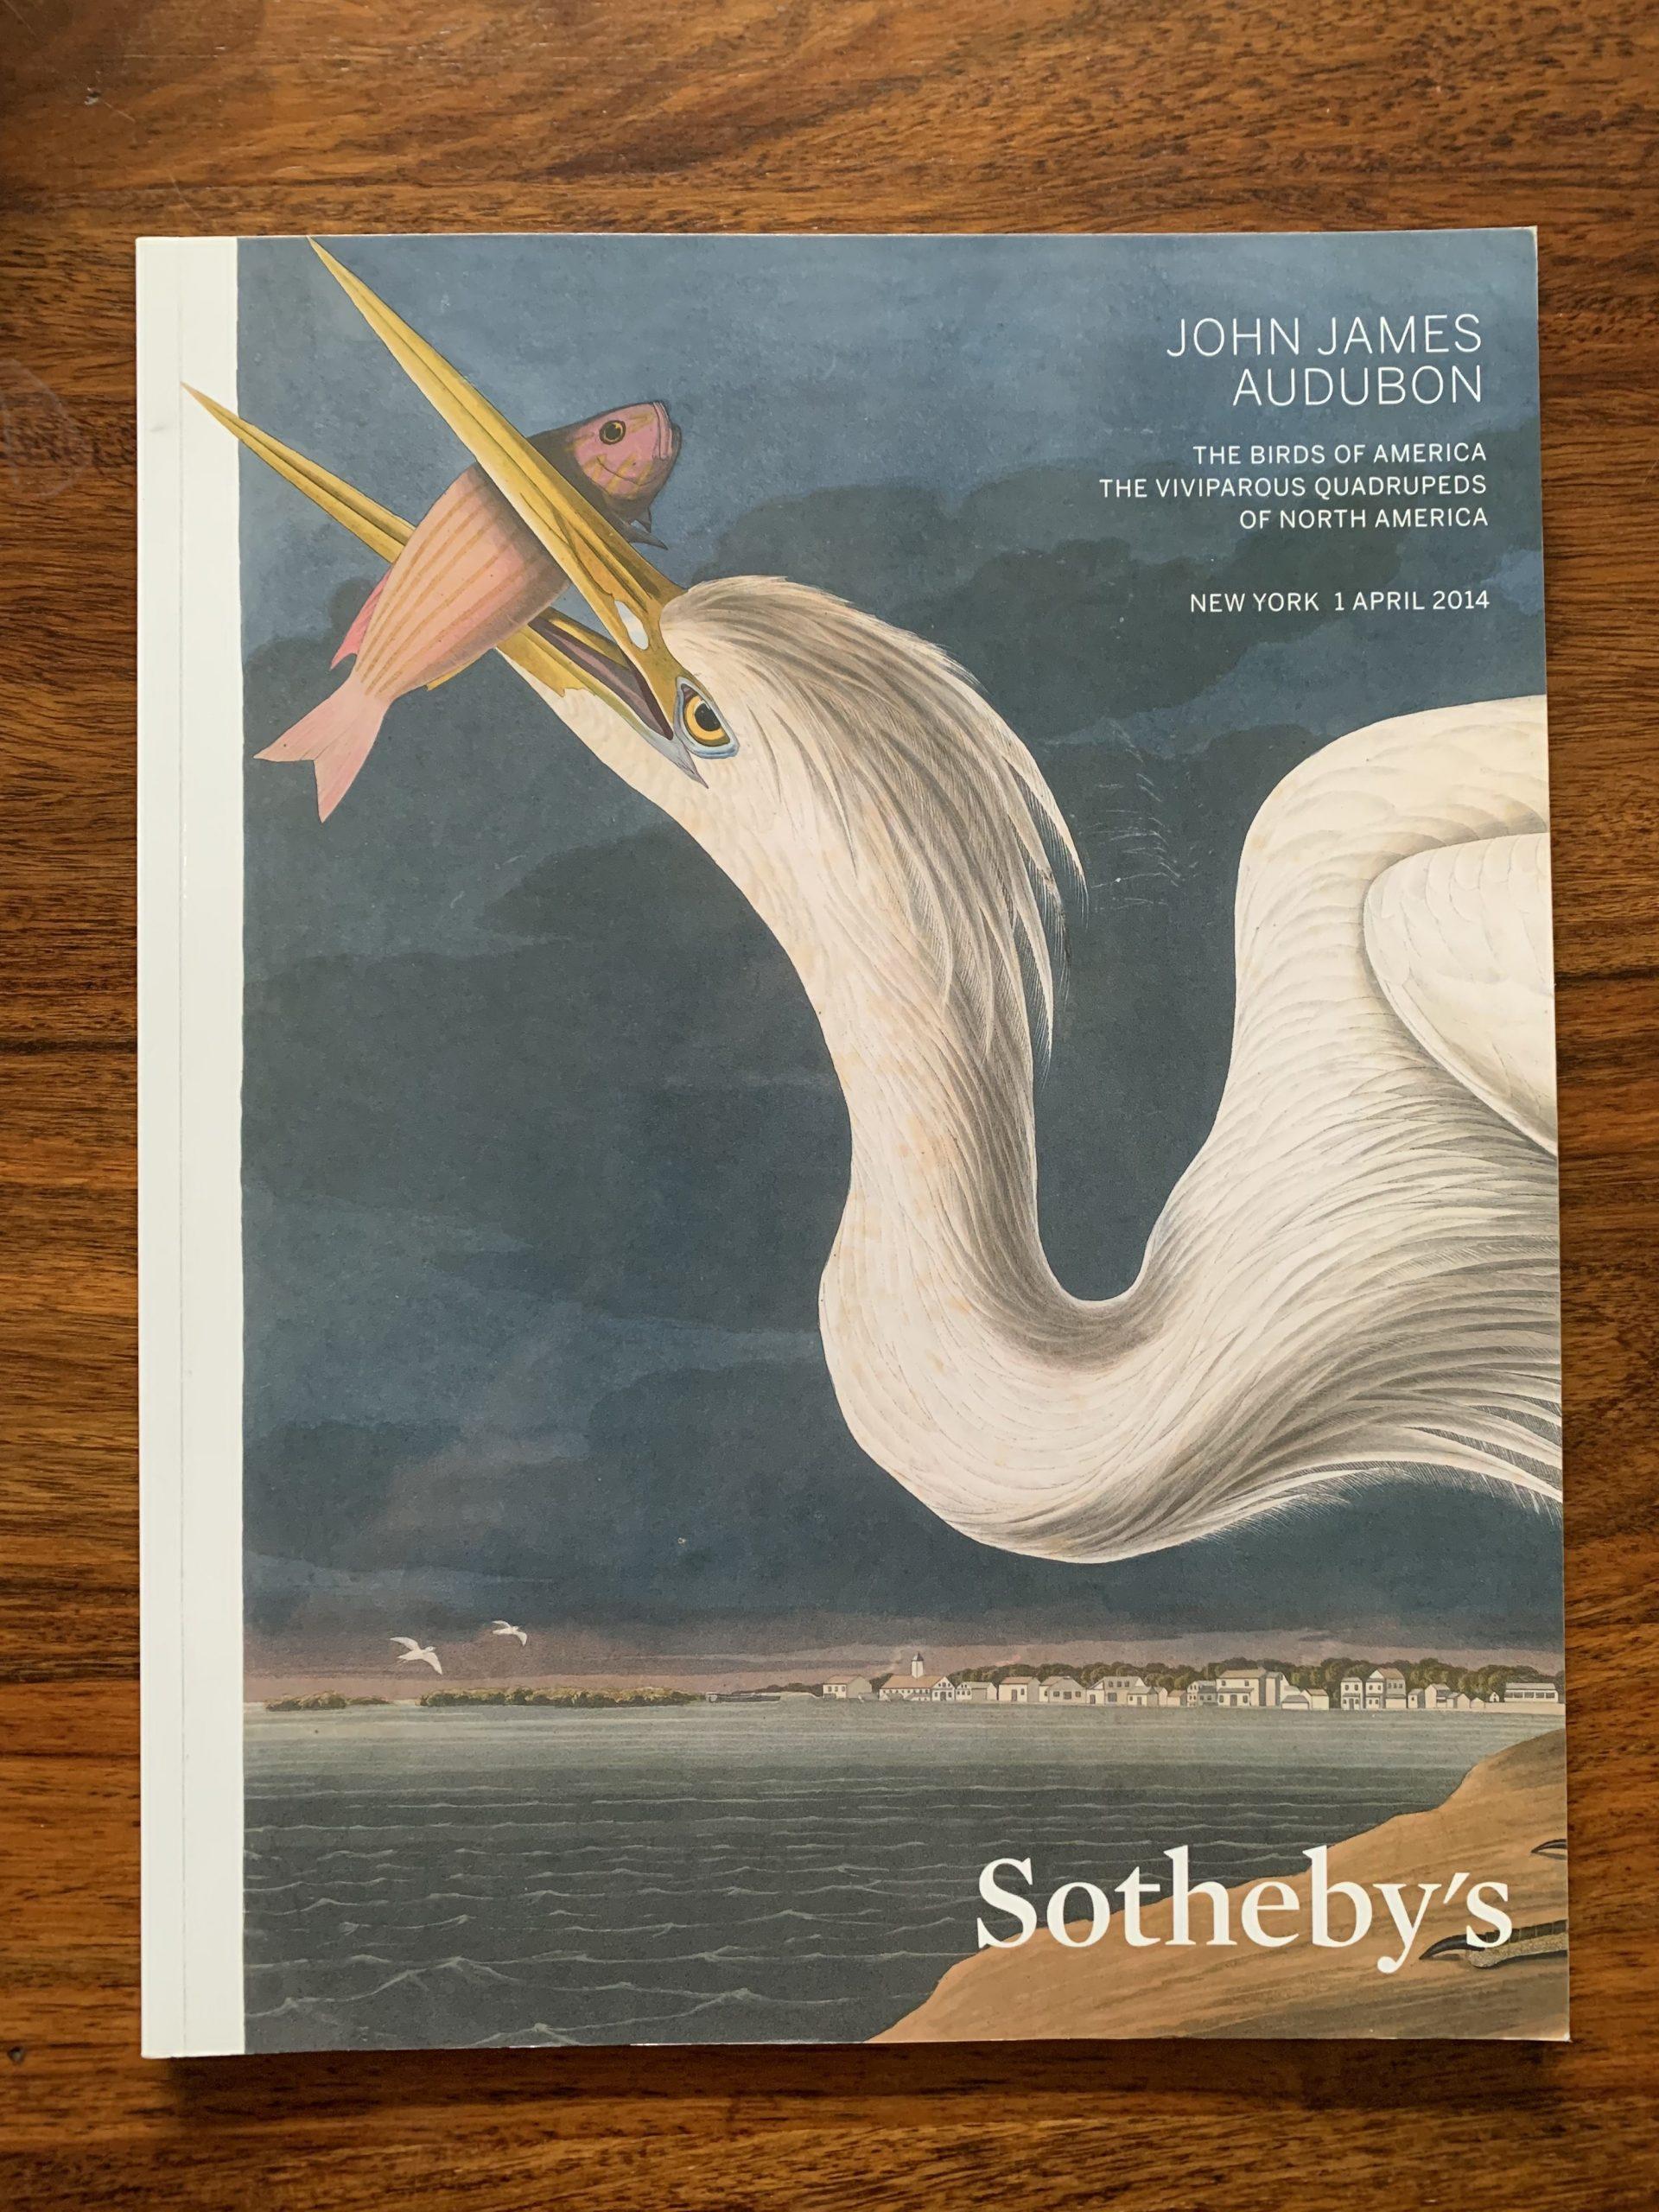 Sotheby's. John James Audubon: The Birds of America.